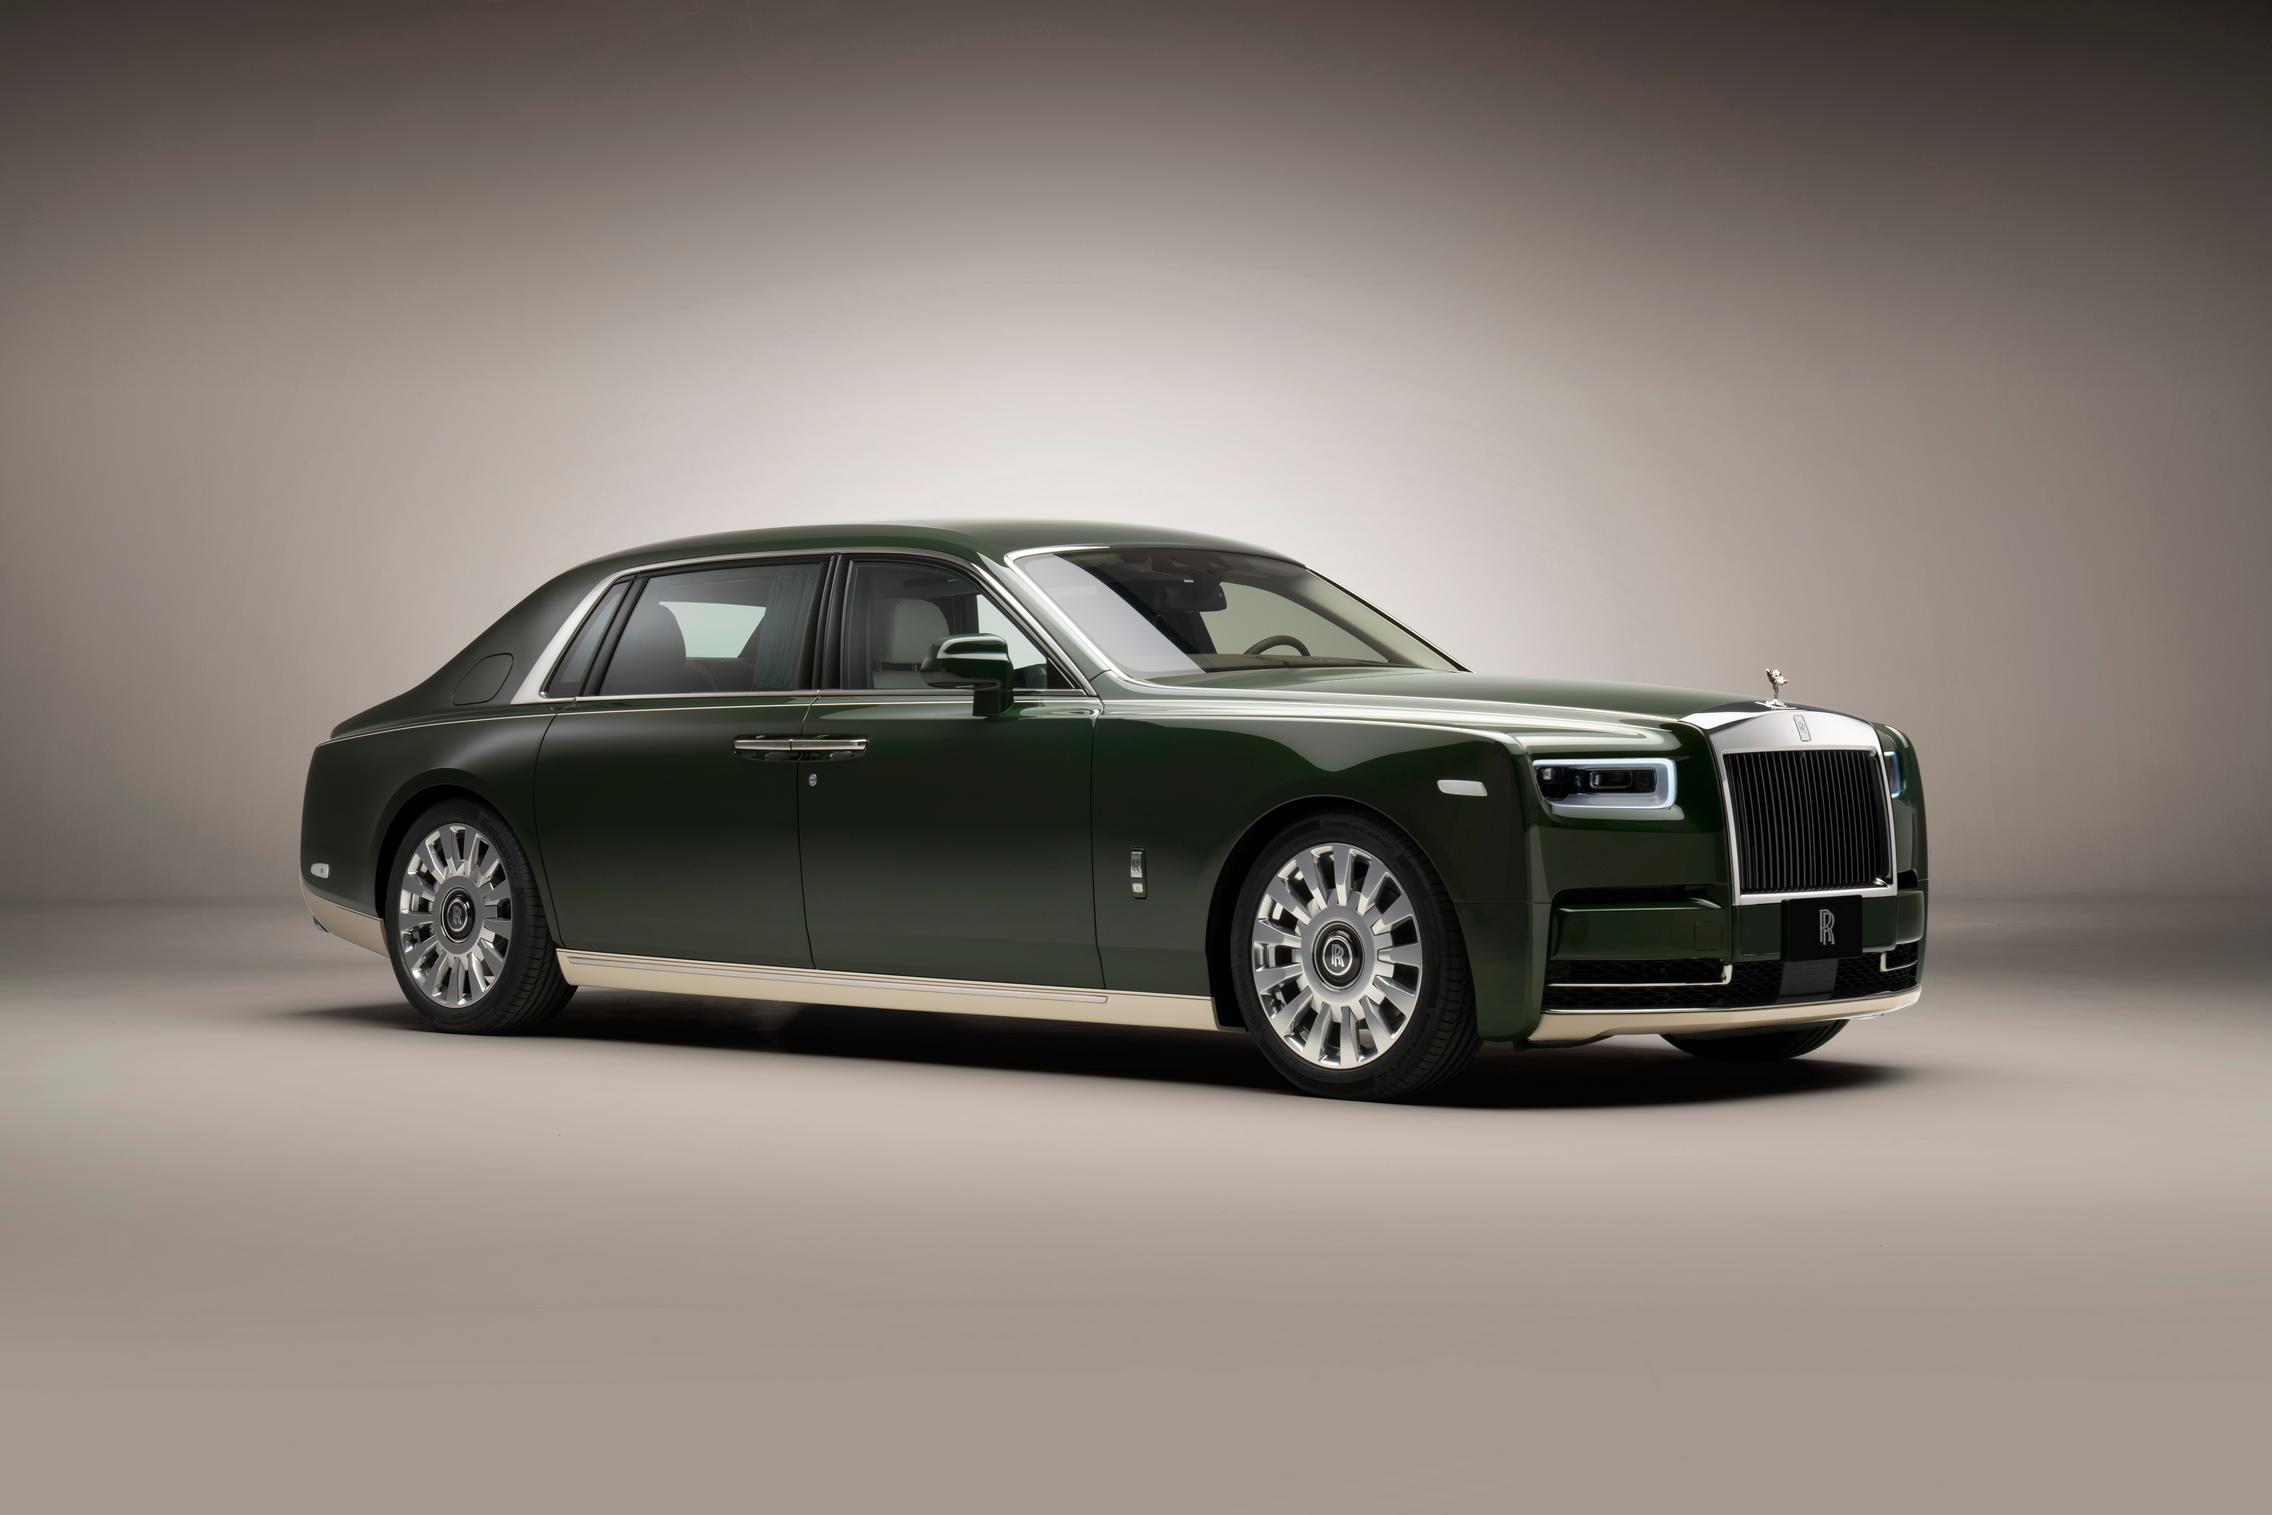 Hermes Rolls-Royce Phantom